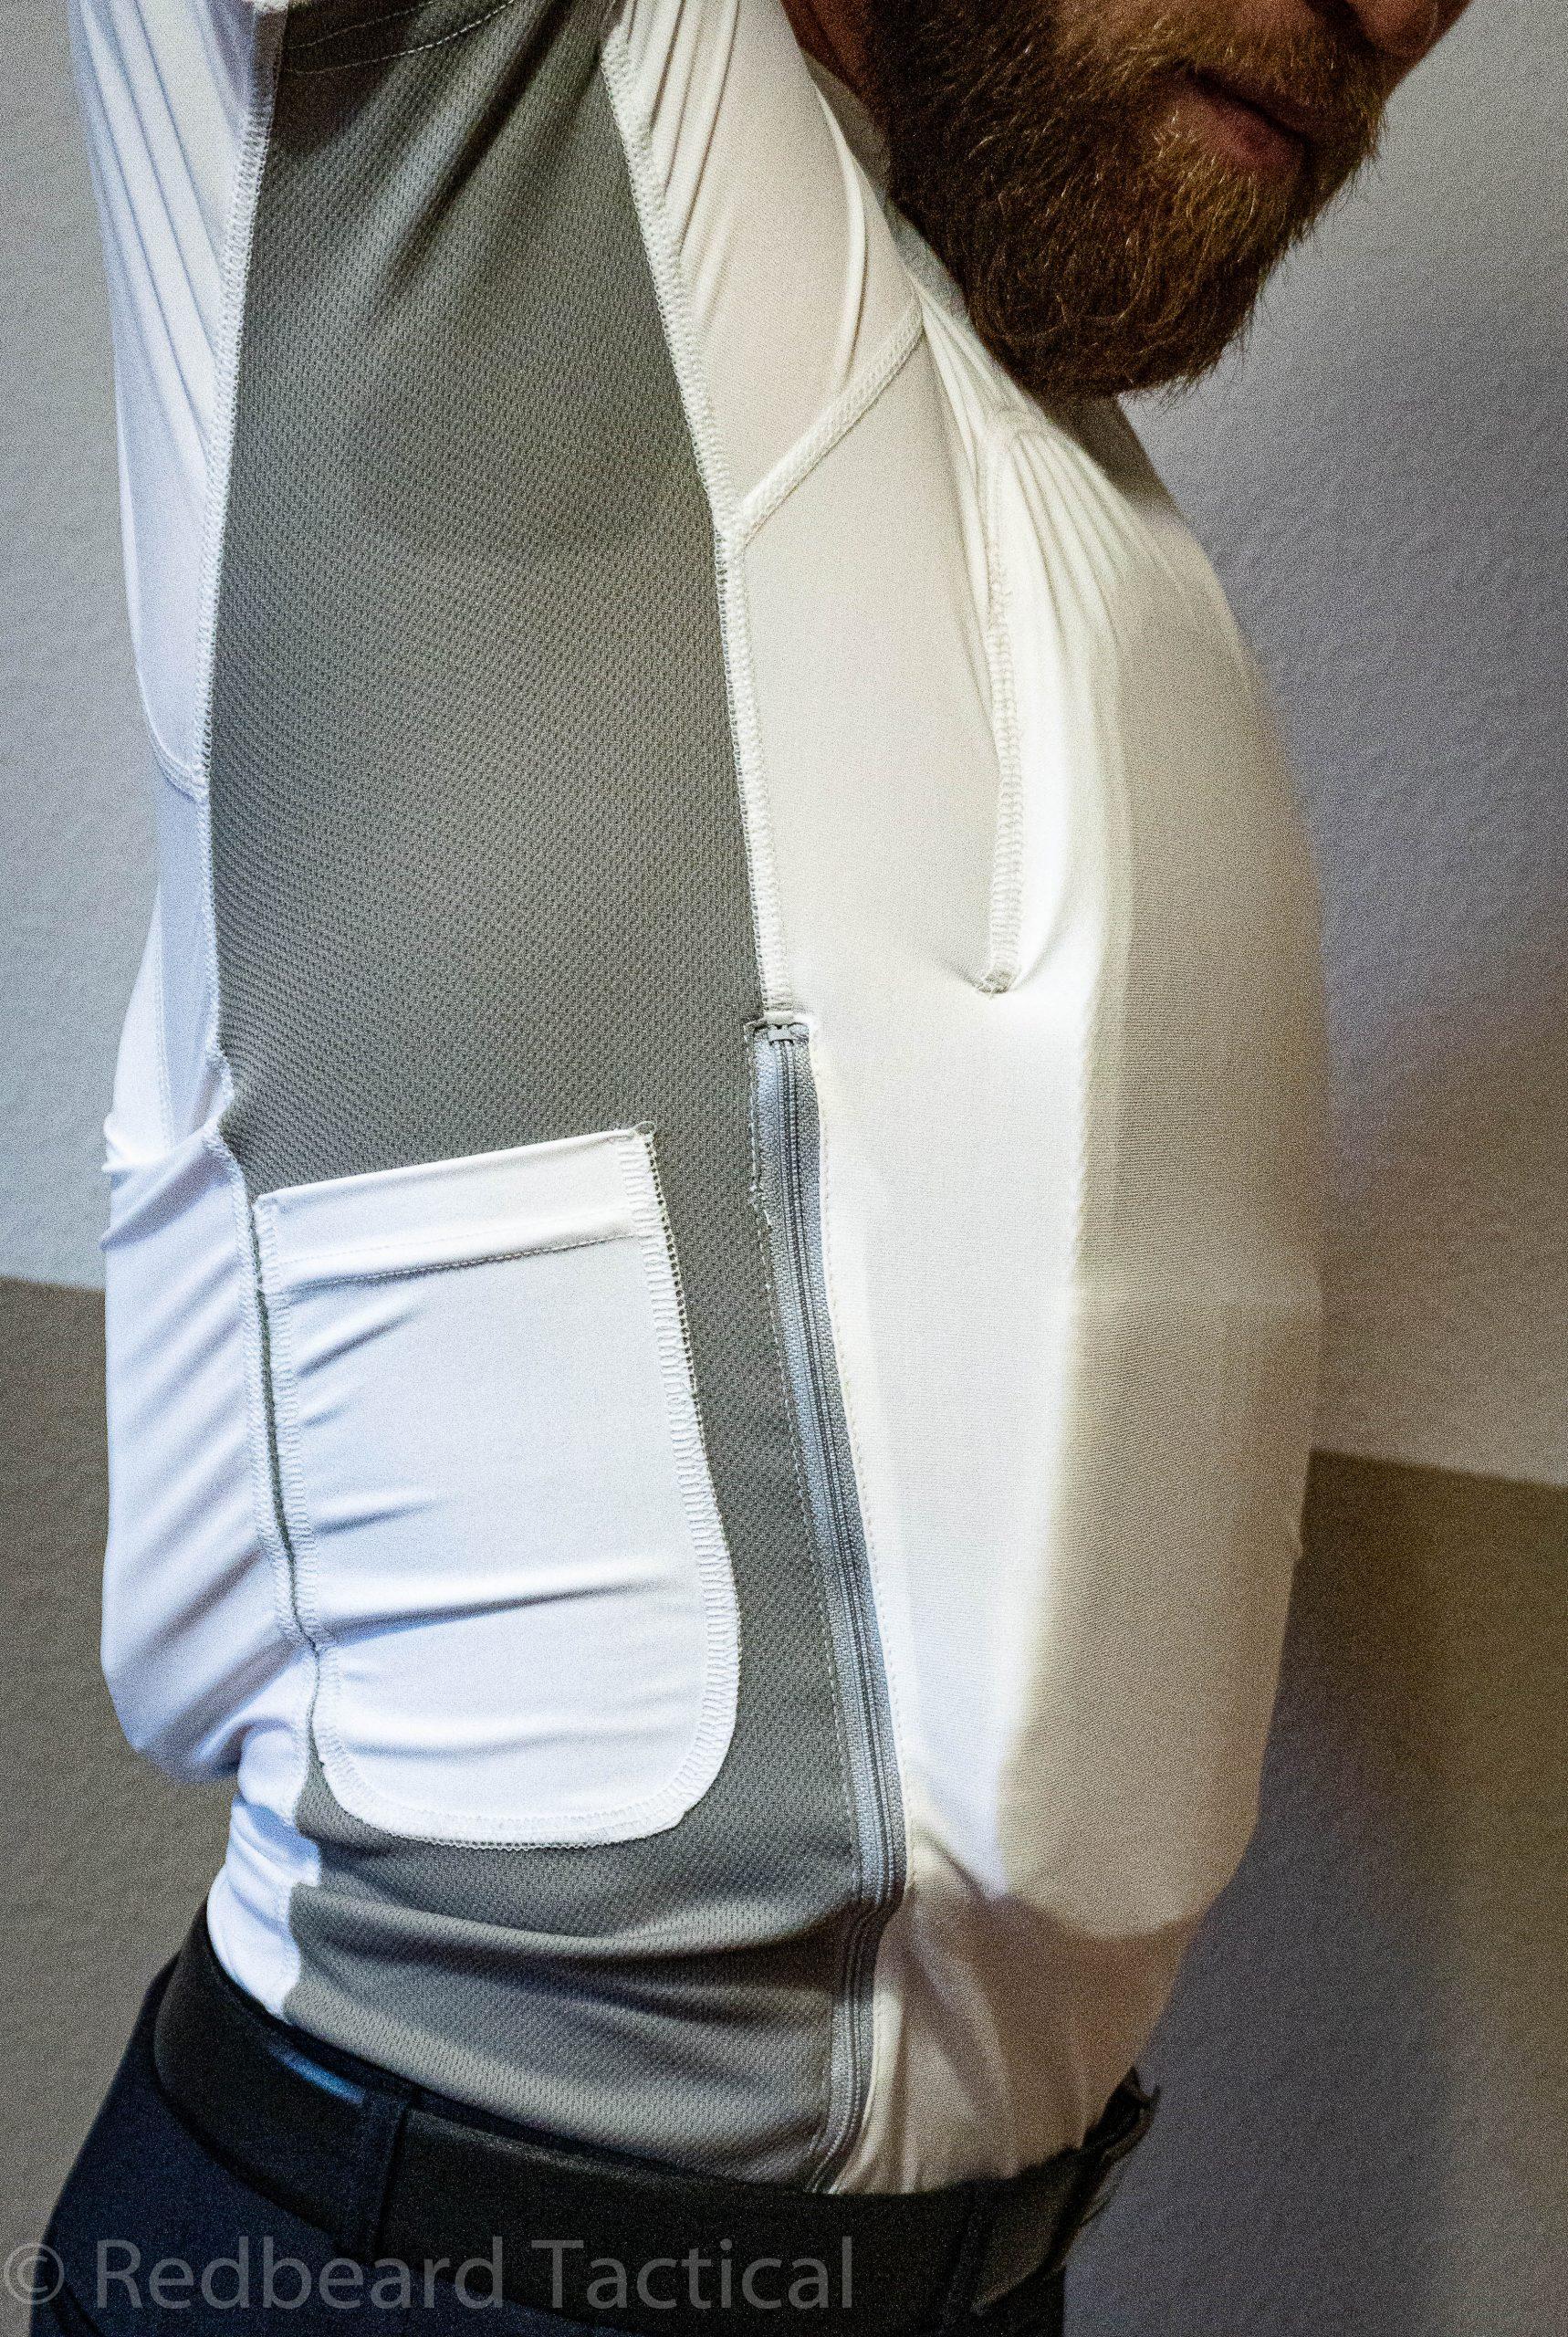 chameleon shirt velocity systems